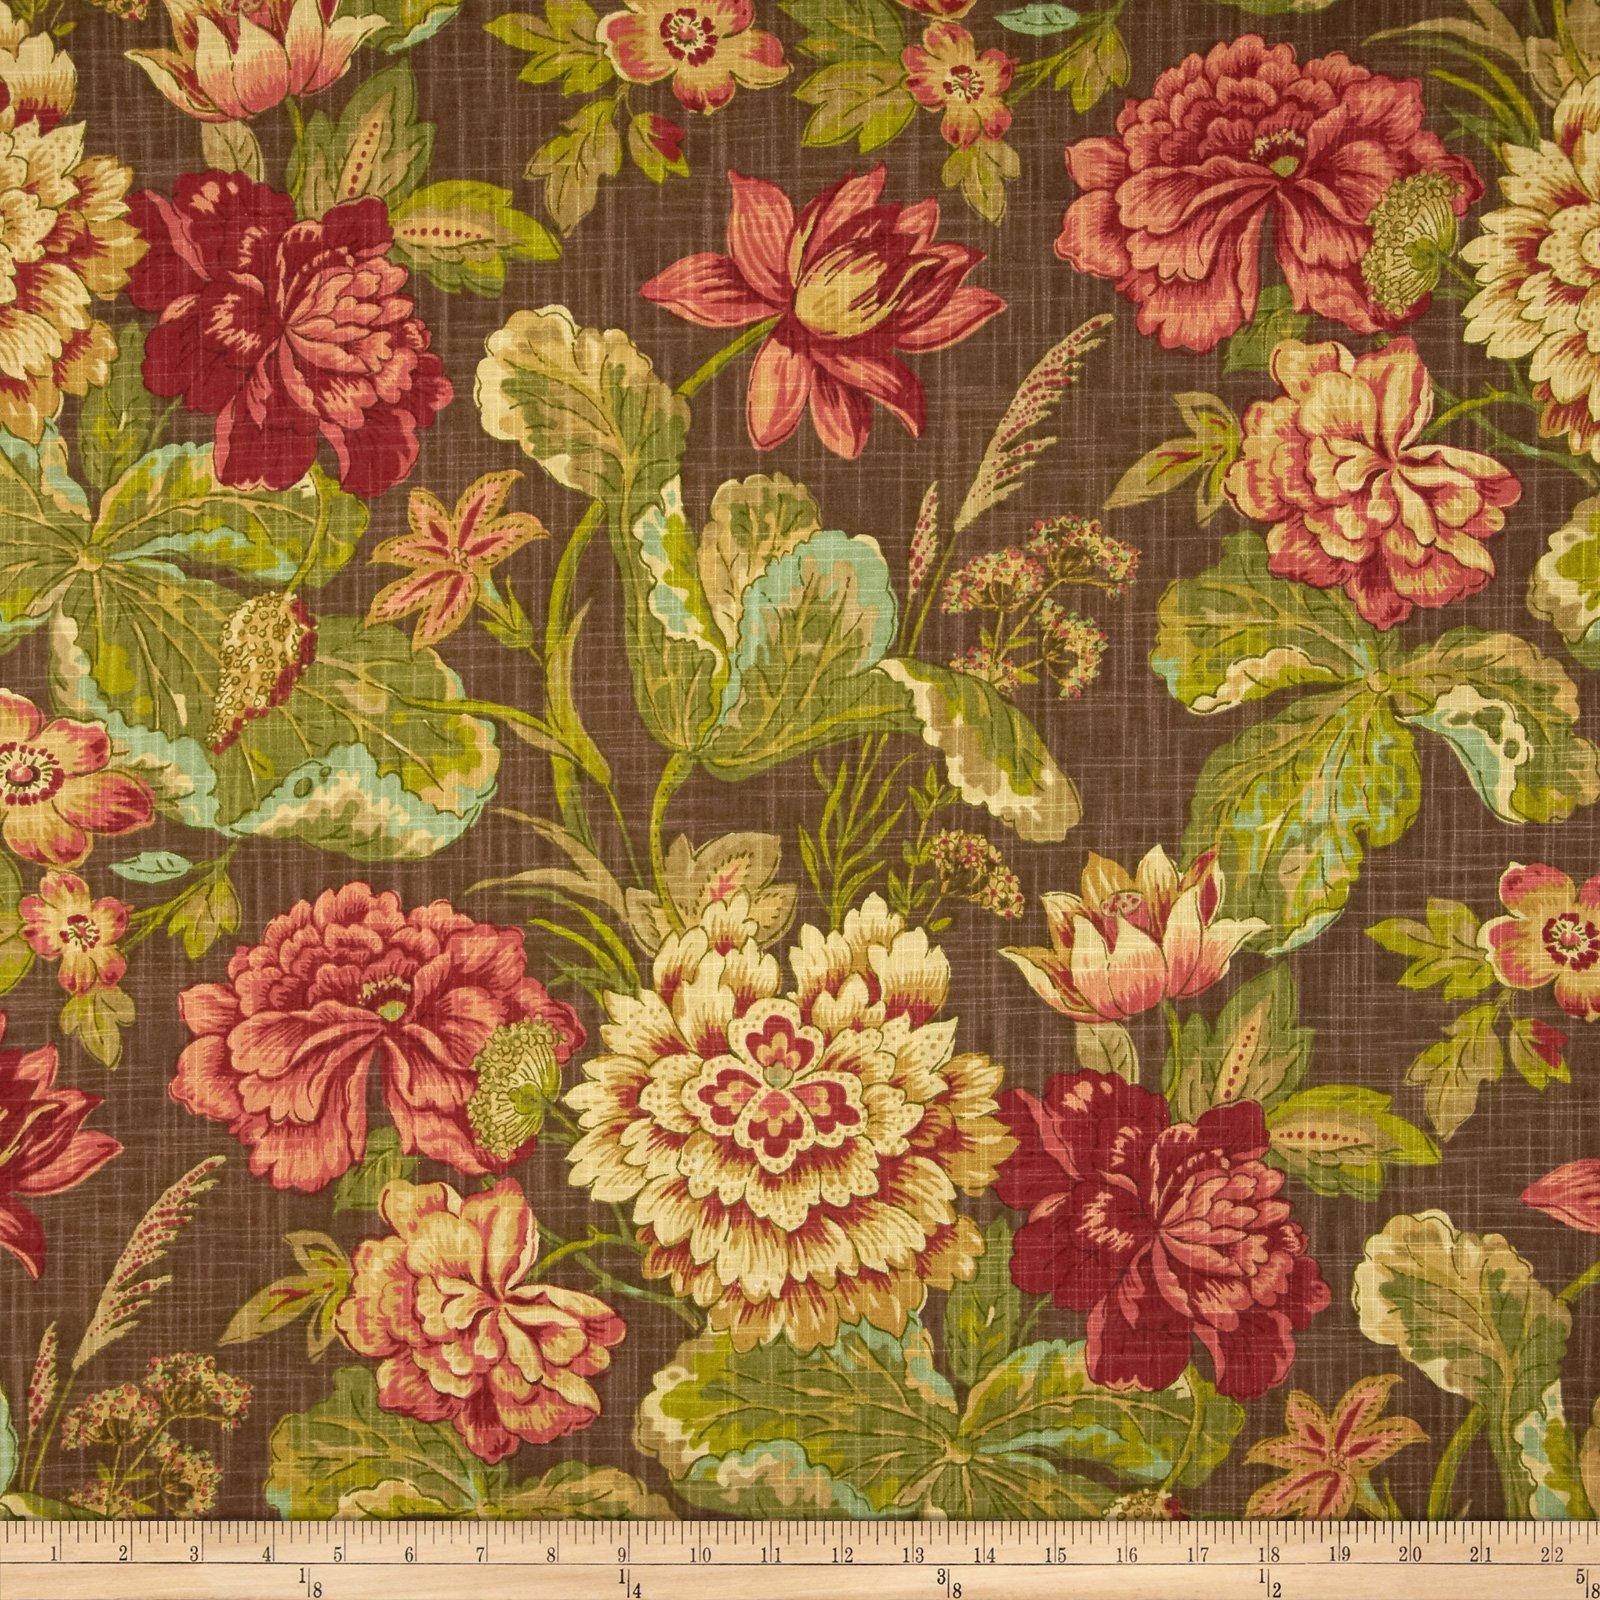 Waverly Sonnet Sublime Slub Fabric, Vintage